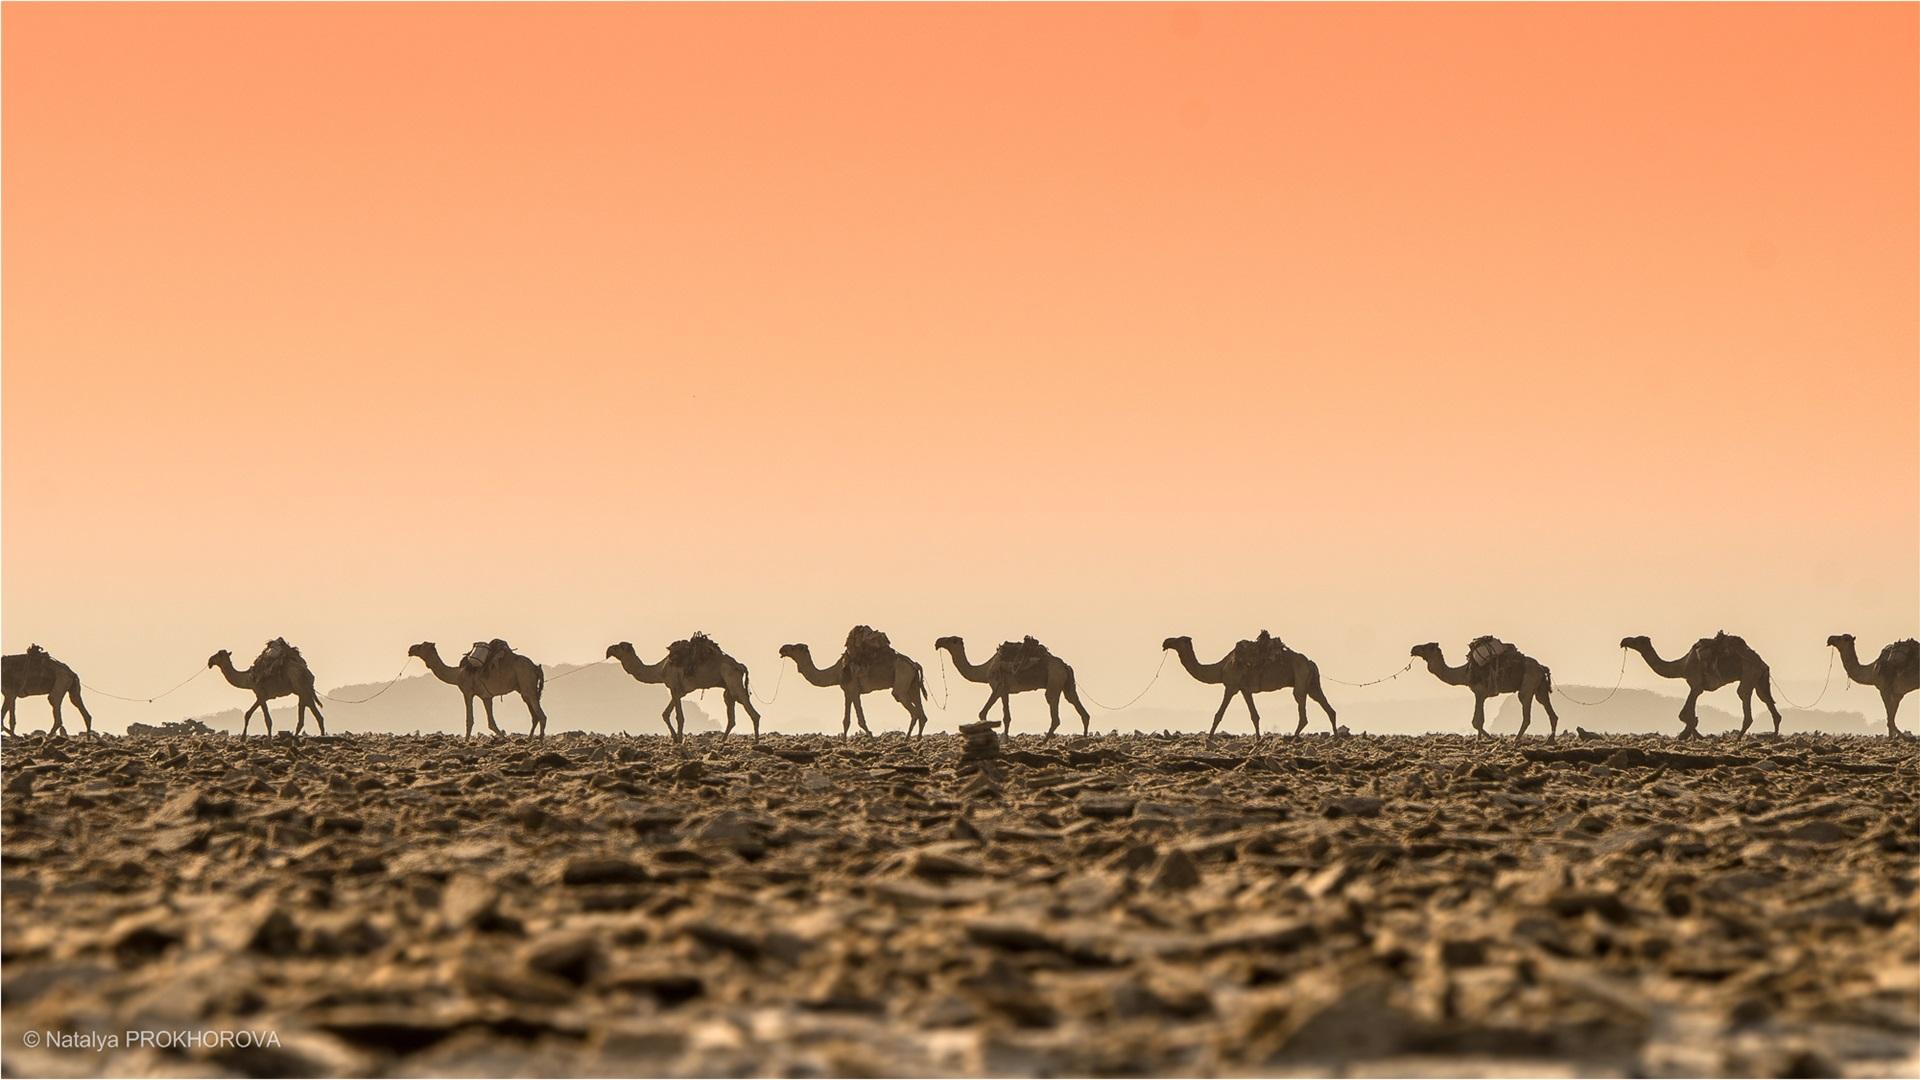 Wallpaper Desert Camels Dawn 1920x1080 Full Hd 2k Picture